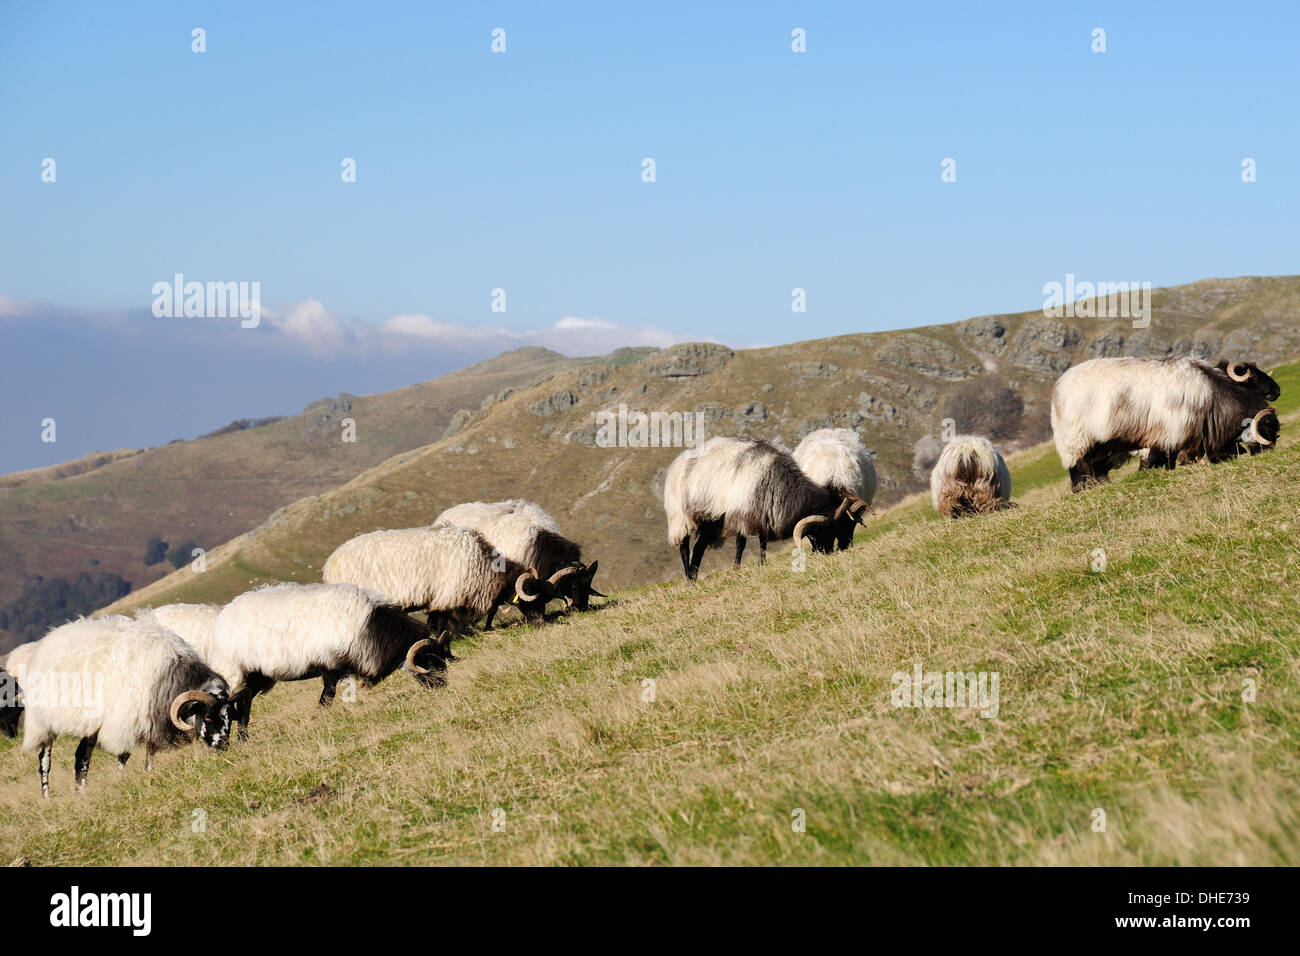 Manech sheep (Ovis aries) grazing Pyreneean mountain pastureland at Fort Lindux, Roncesvalles. - Stock Image